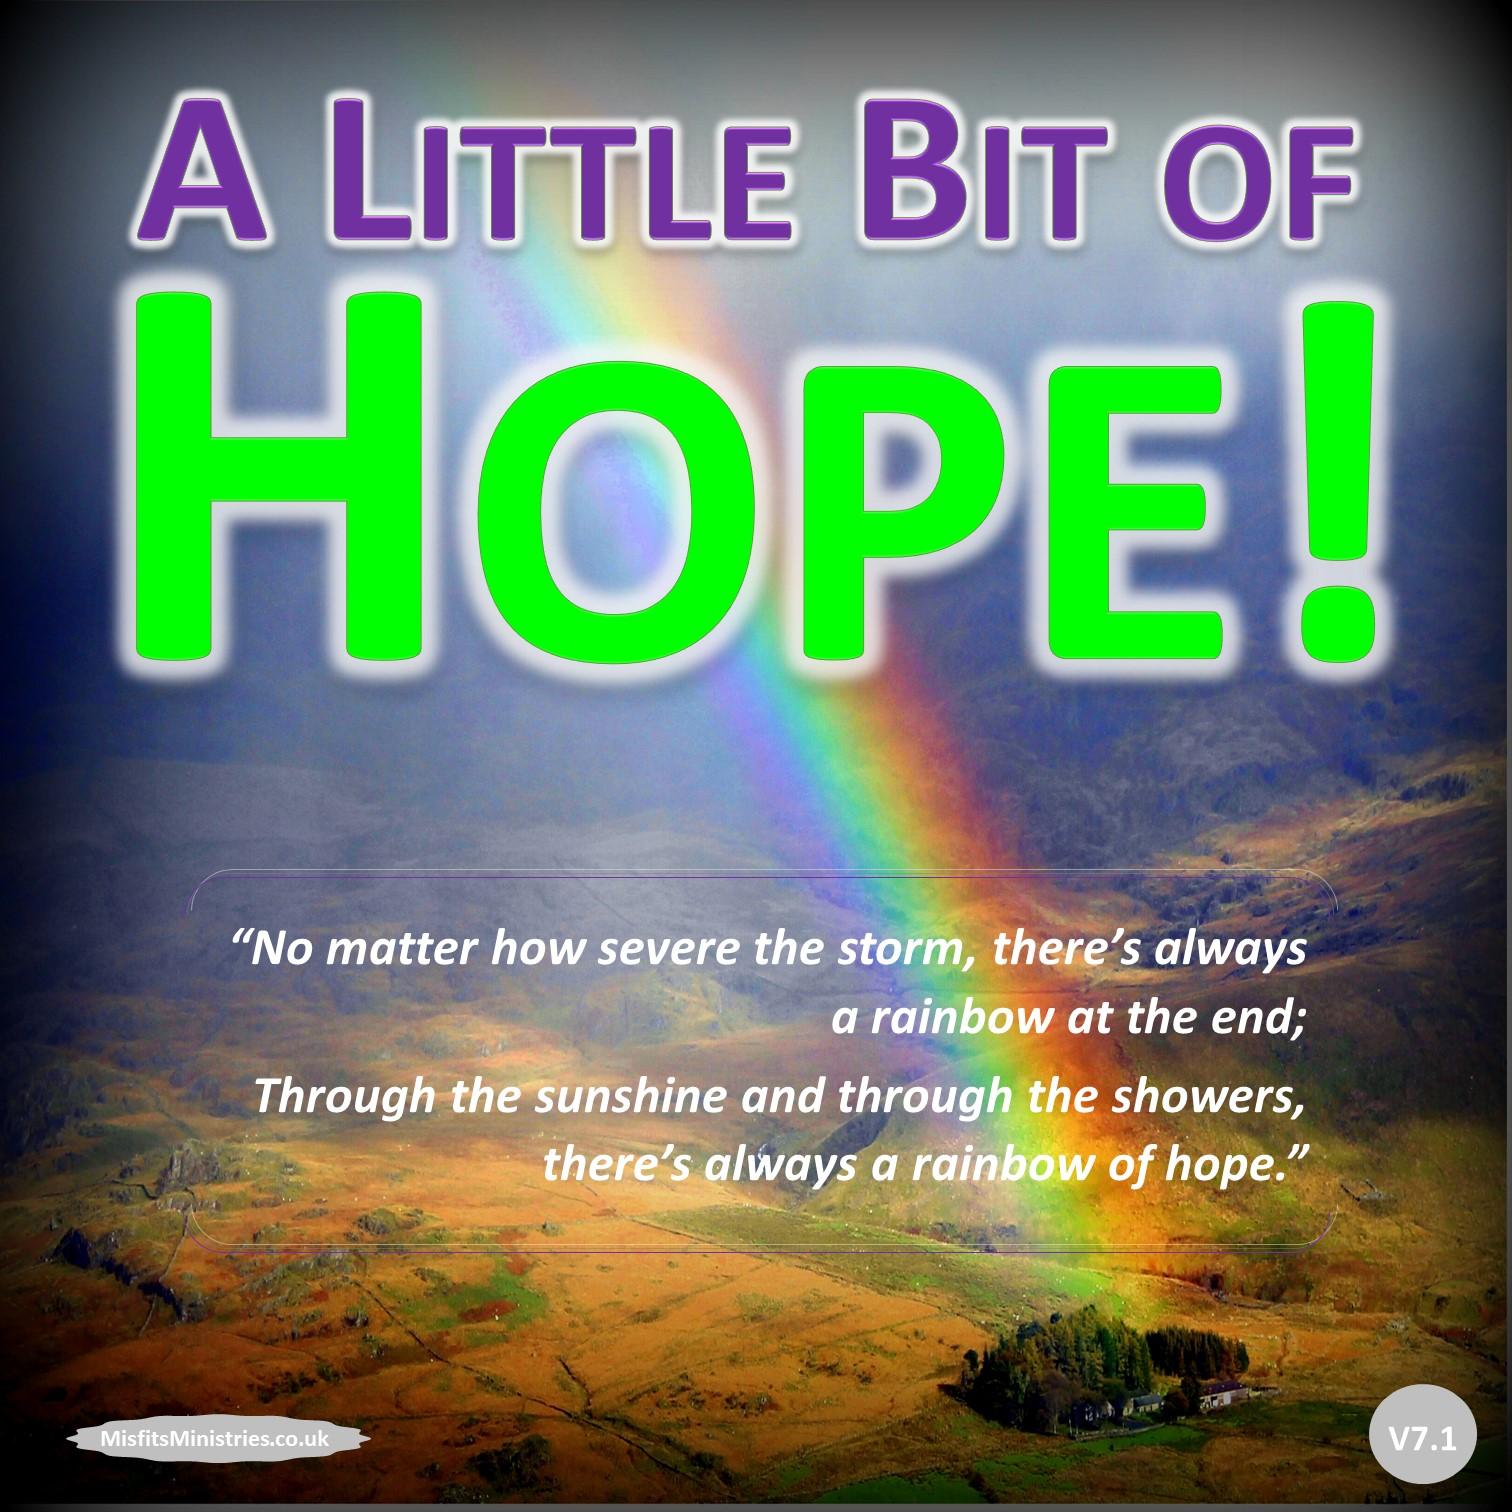 A Little Bit of Hope! - pdf version